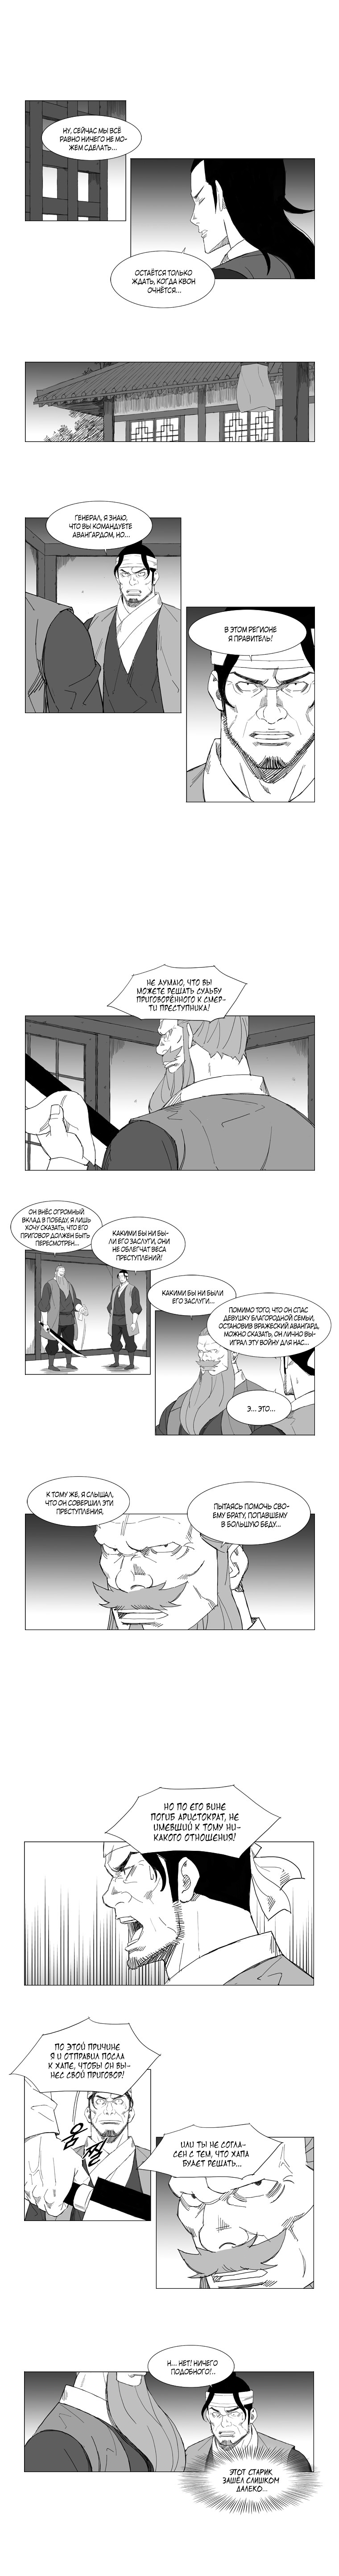 https://r1.ninemanga.com/comics/pic2/39/28263/331930/1502975992979.jpg Page 2